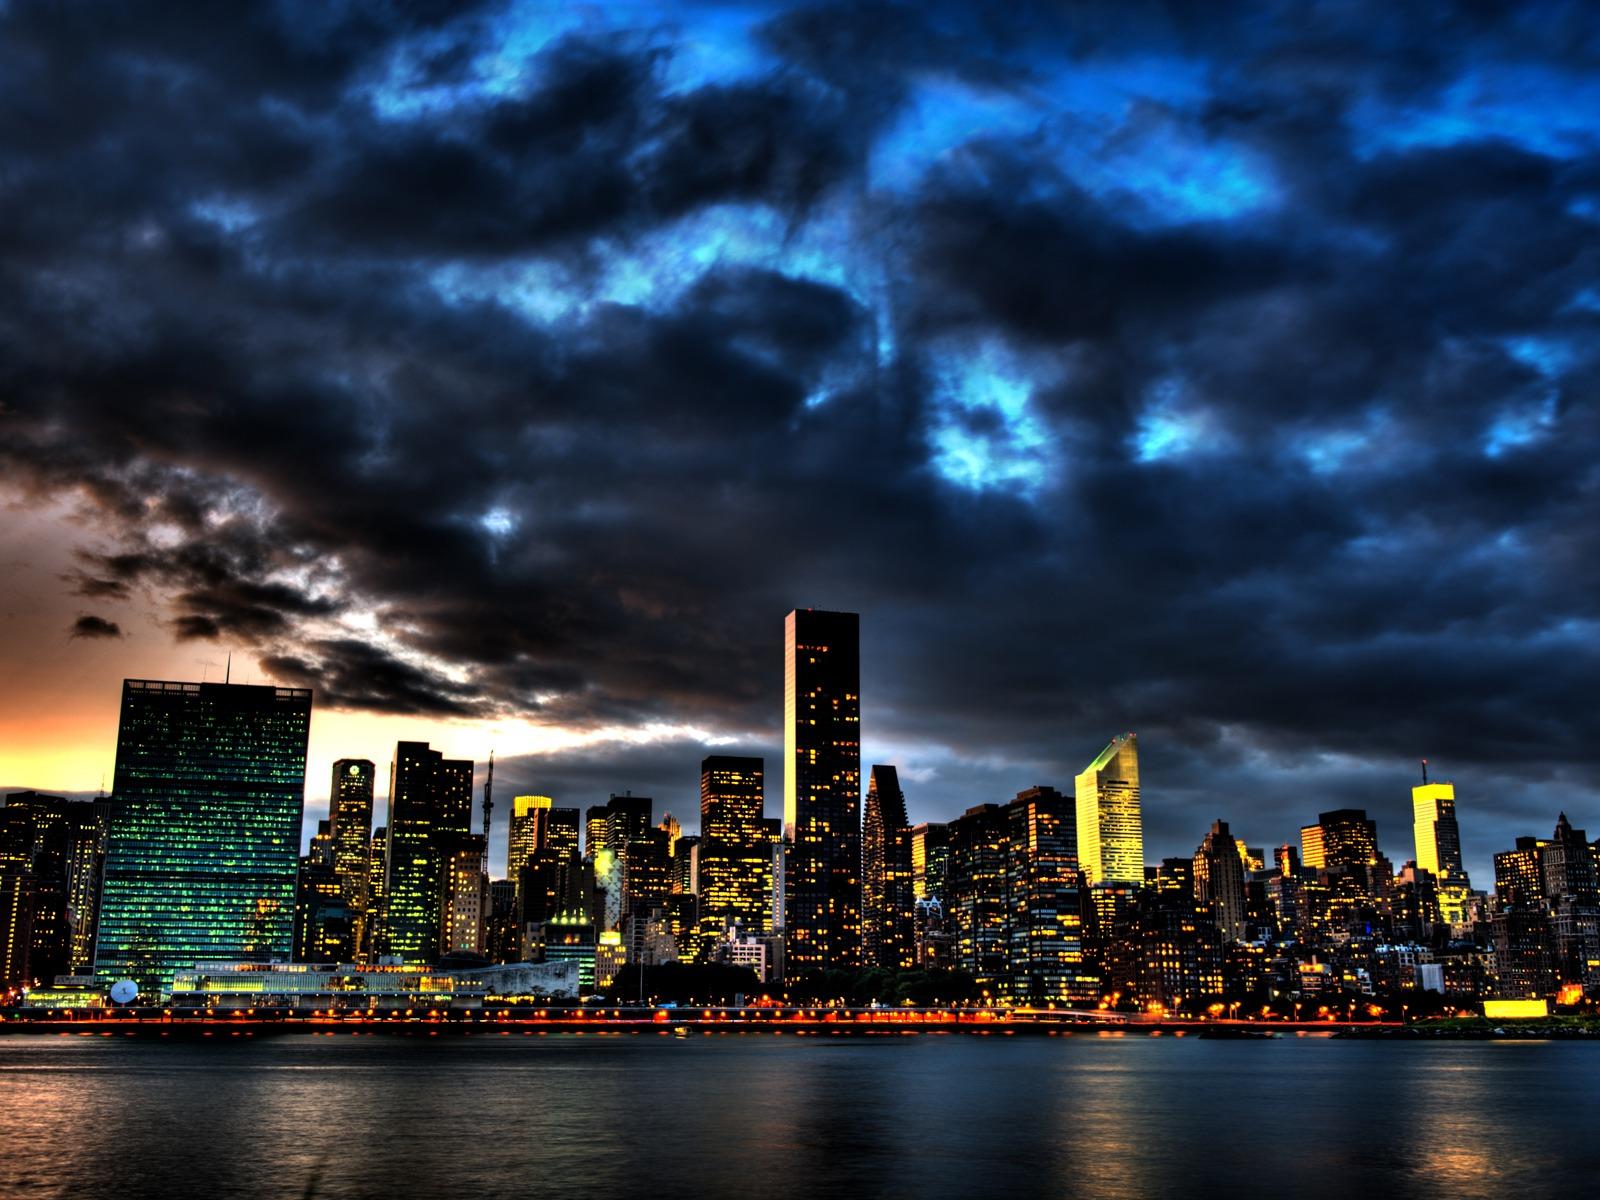 World city night album 7 funjunktion - Skyline night wallpaper ...